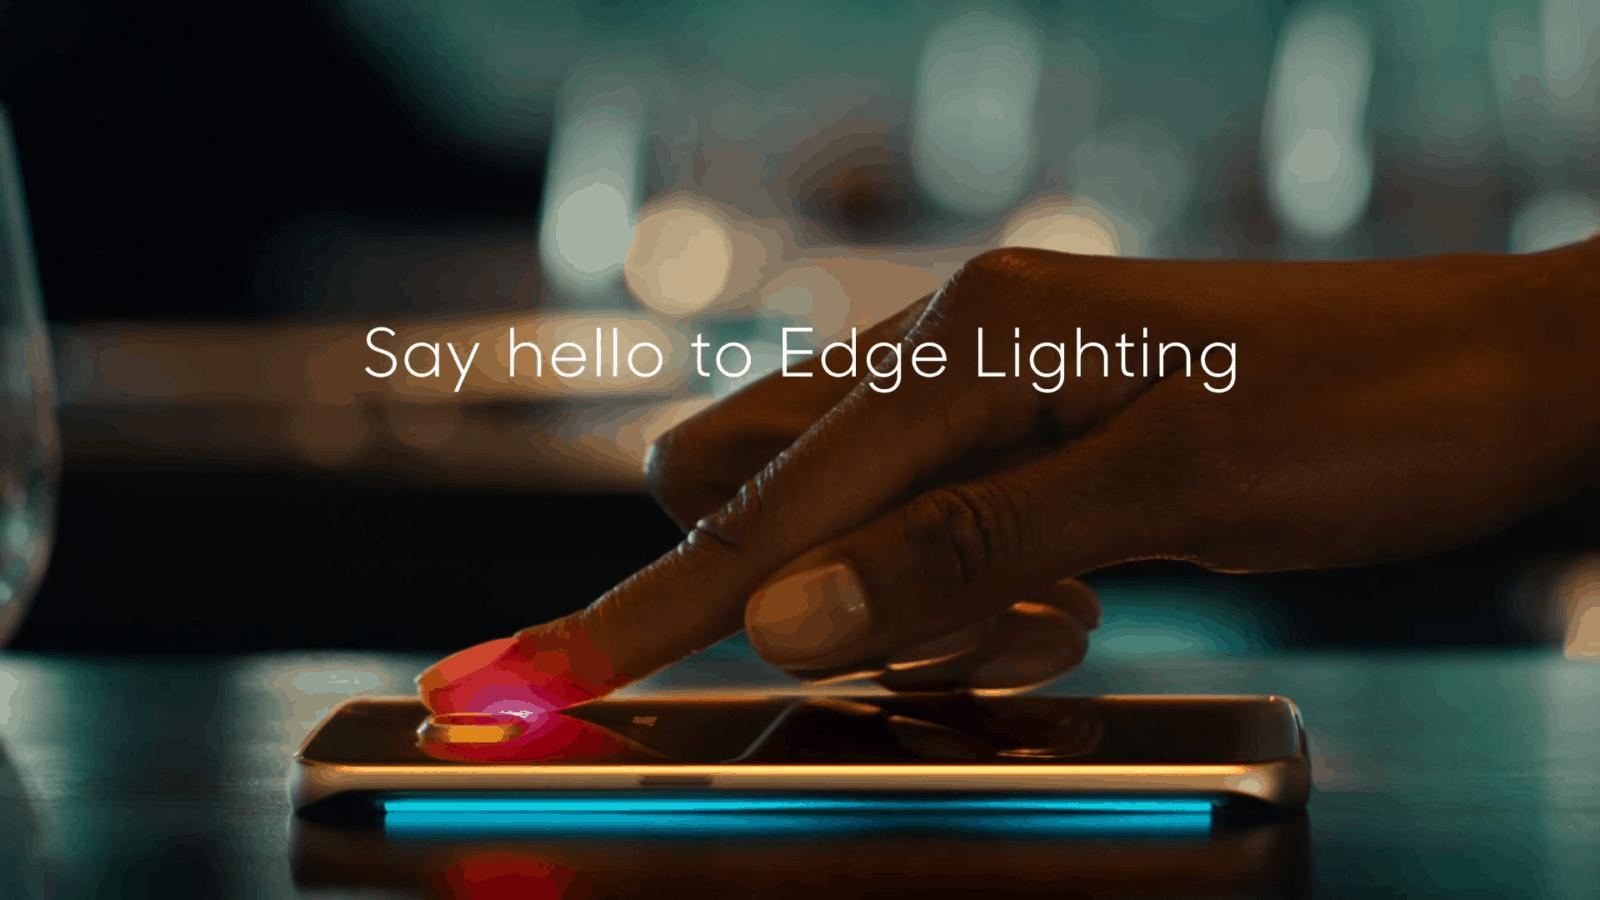 Samsung S6 Edge - Edge Lighting